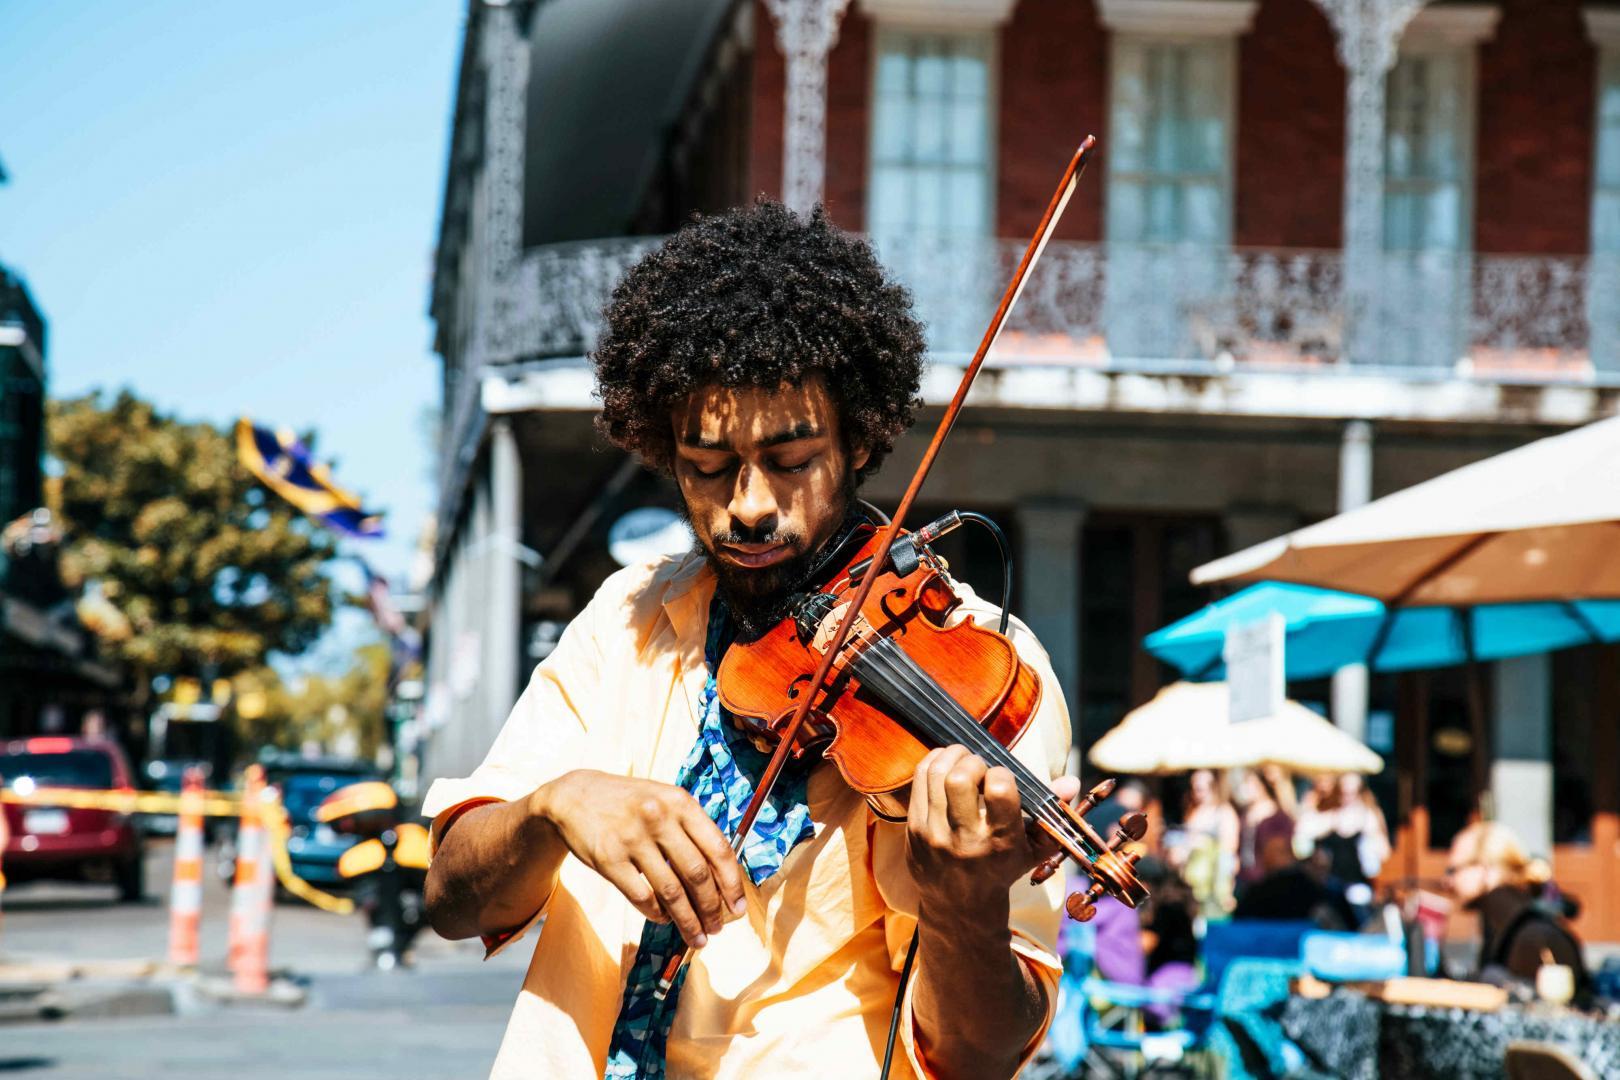 Image result for unsplash musician photos